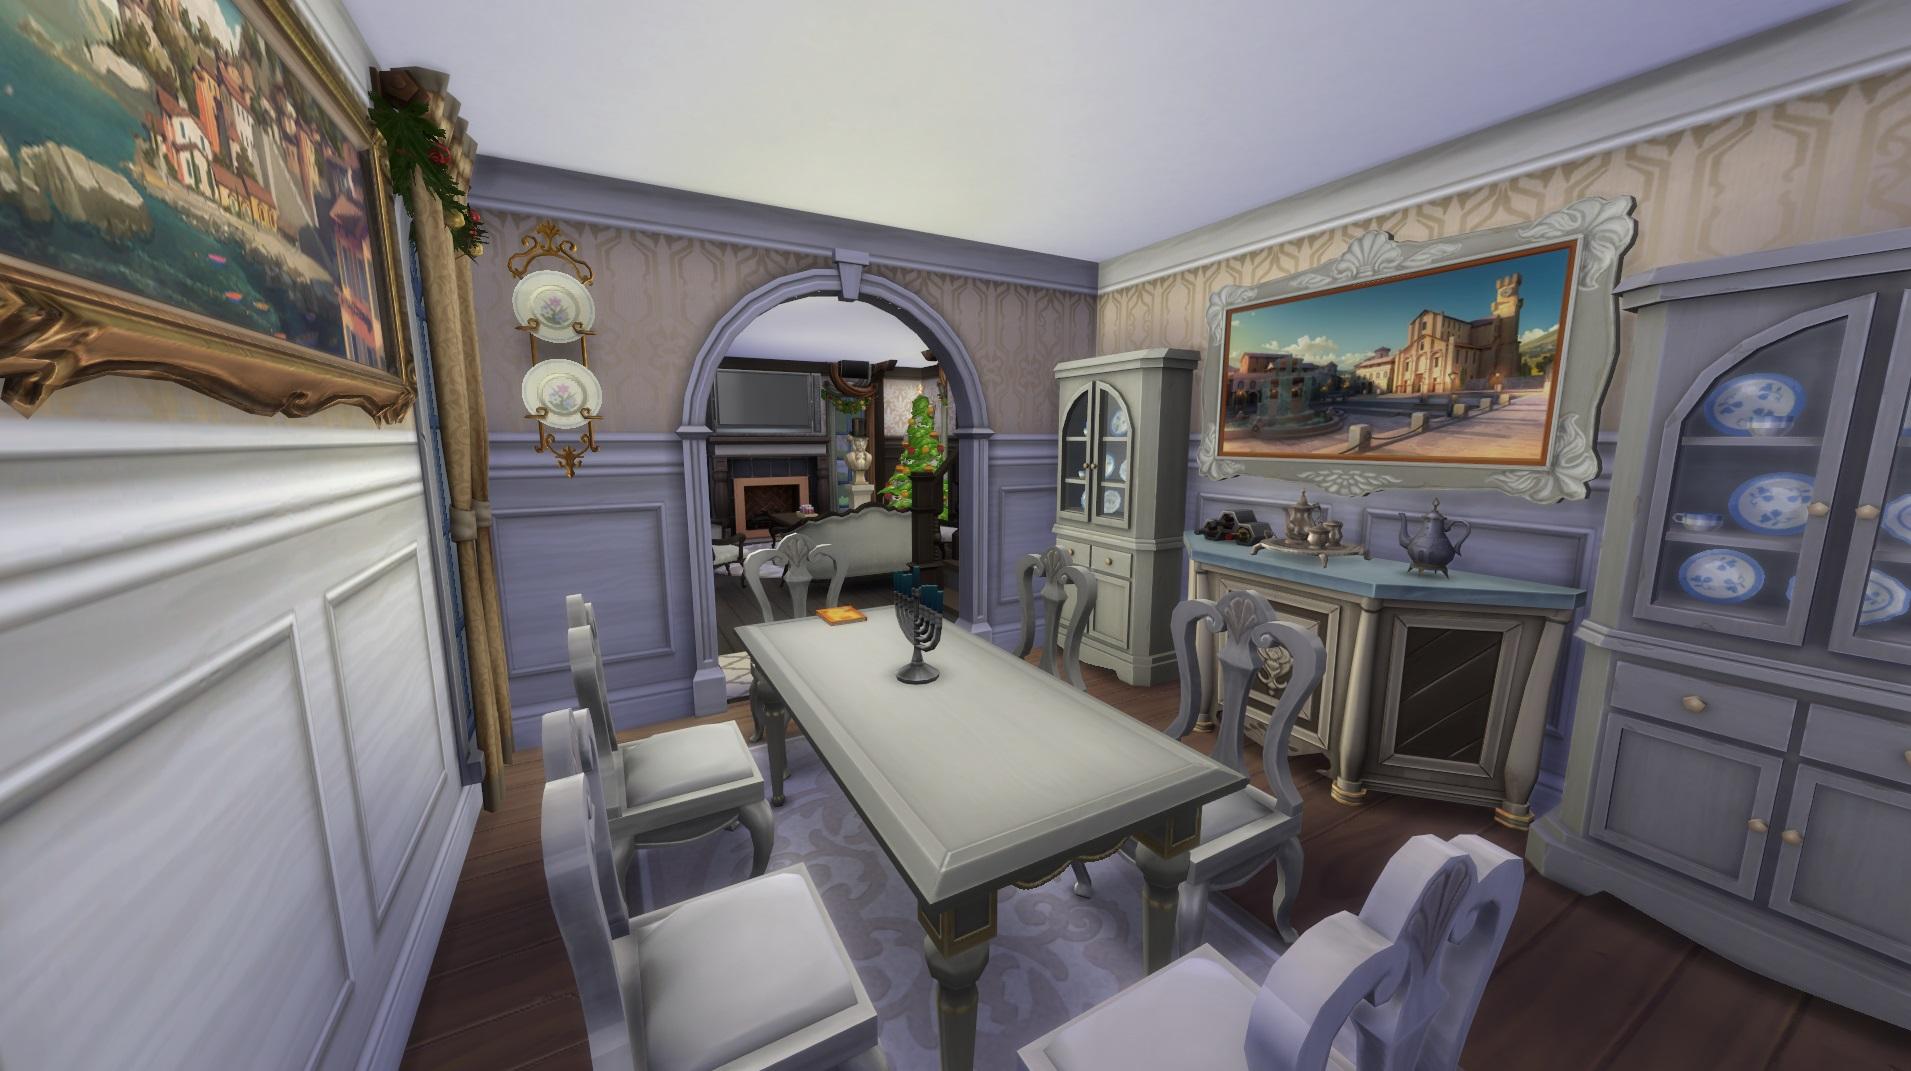 Dining room width